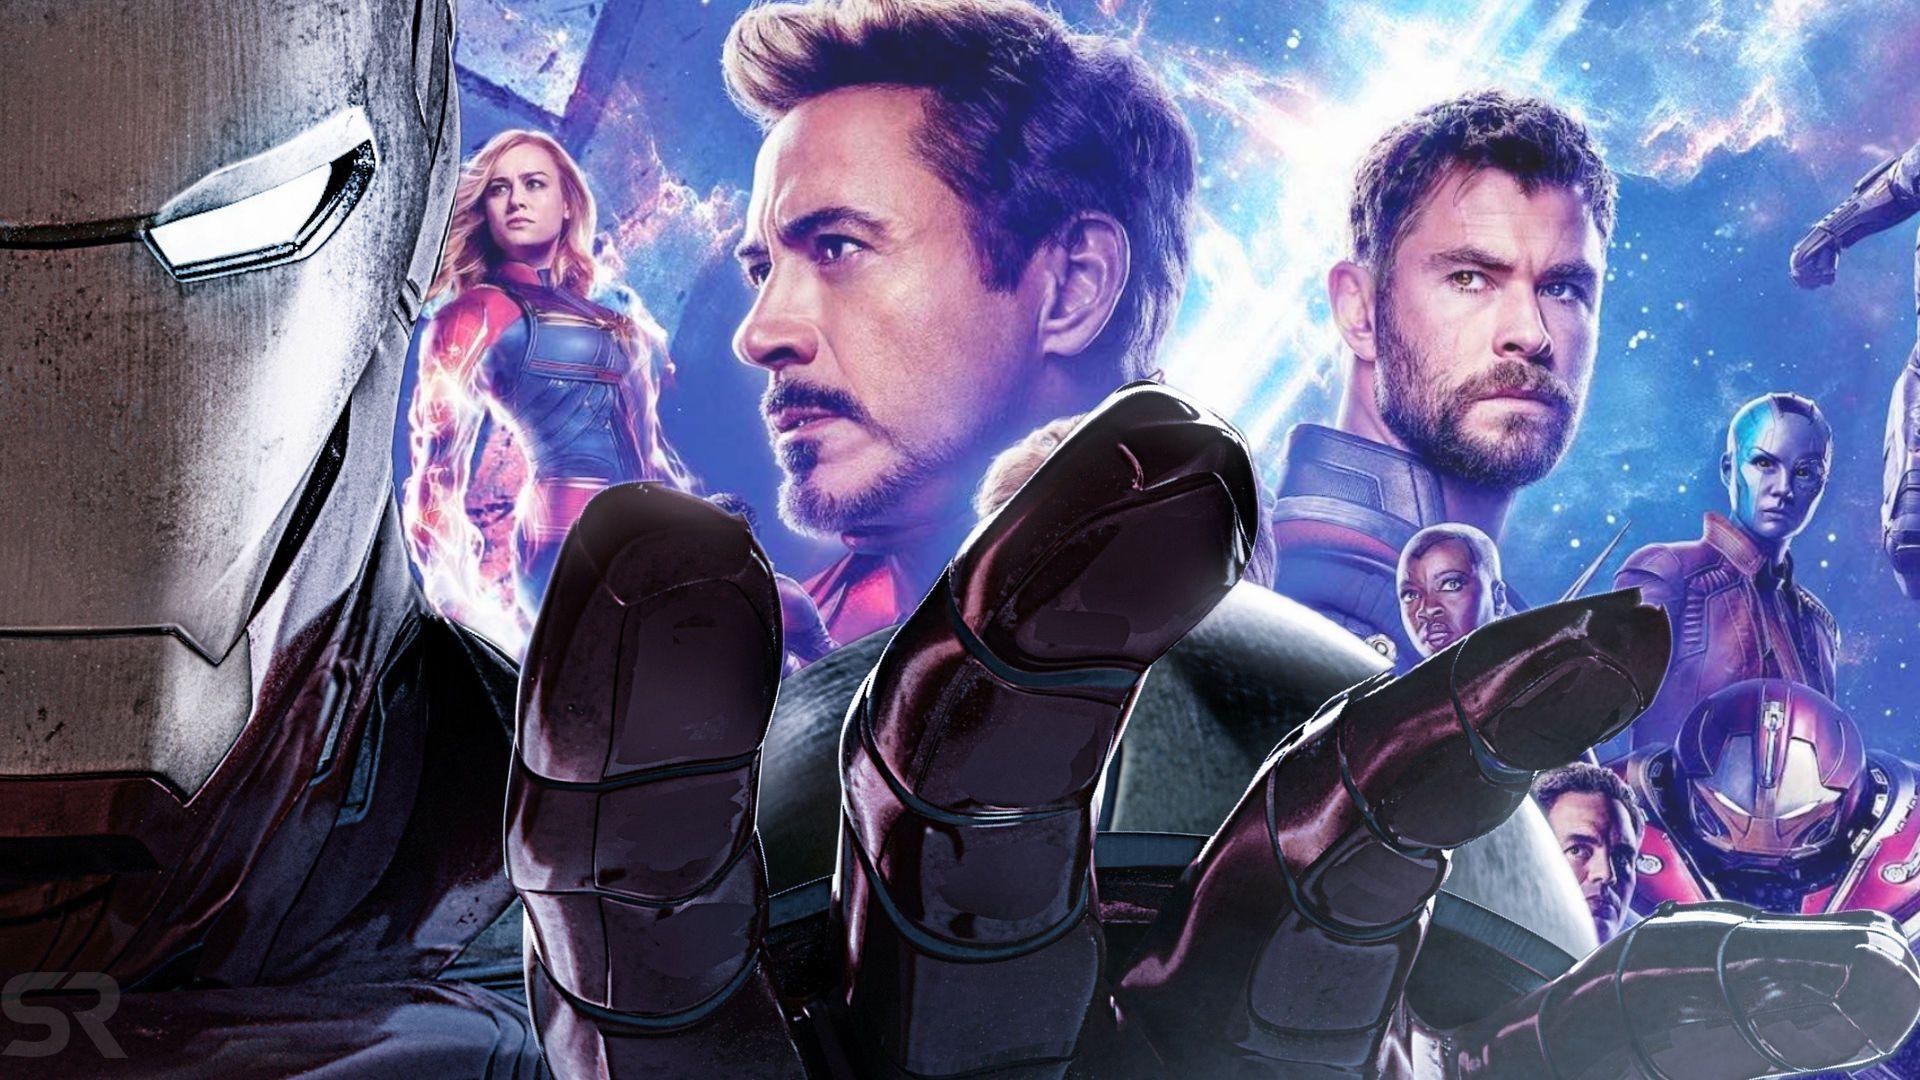 Endgame Bts Photos Videos Reveal Avengers Filming Big Funeral Scene